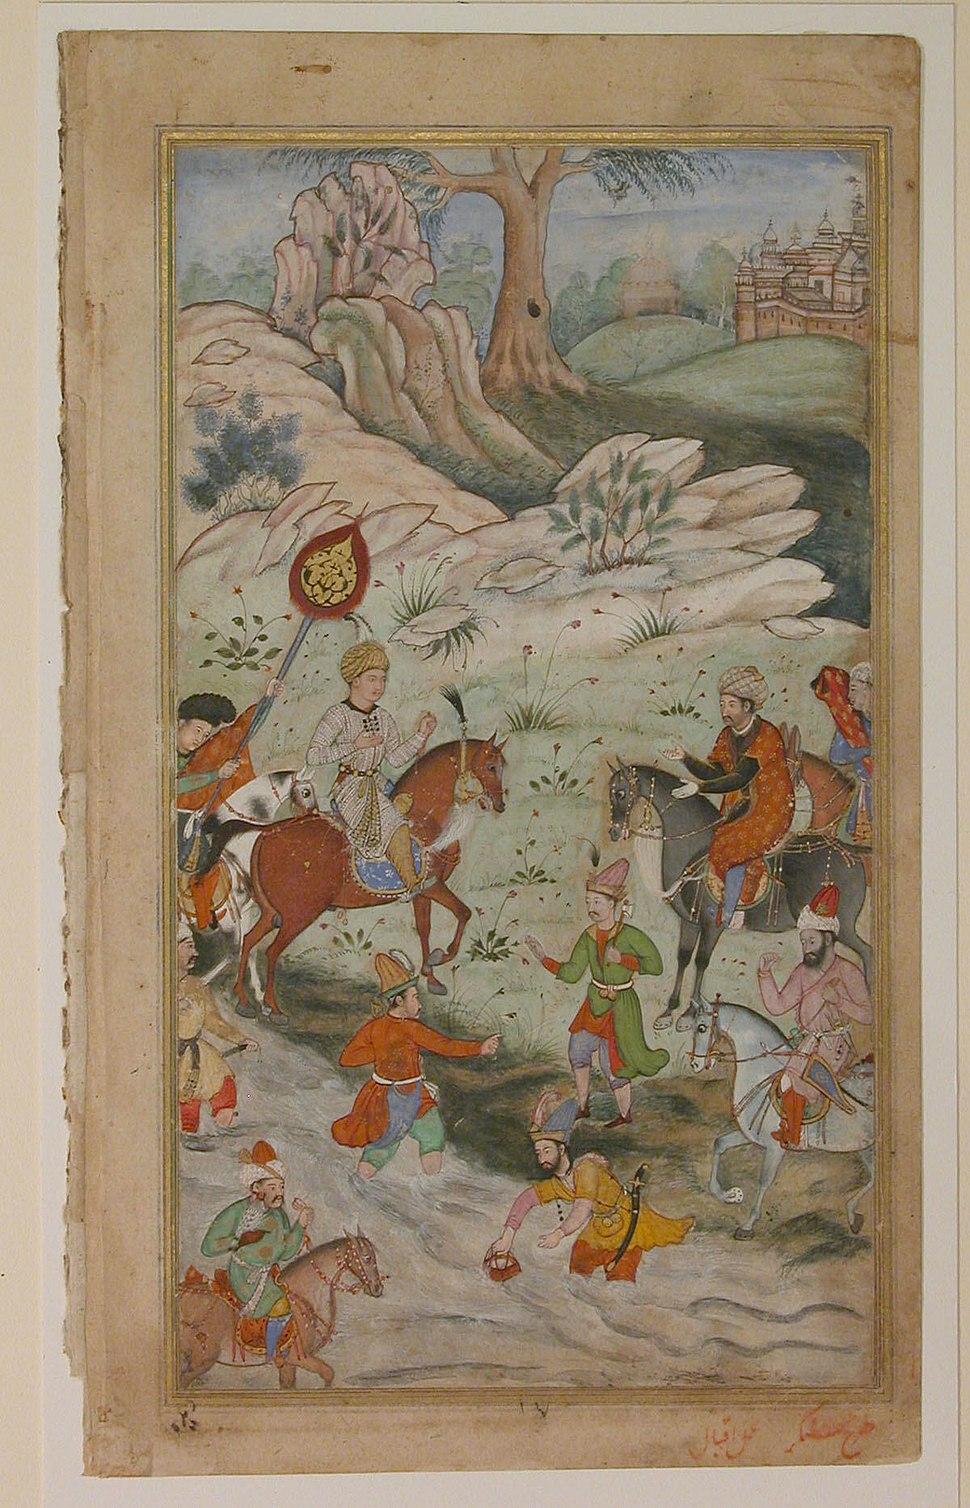 Meeting between Babur and Sultan 'Ali Mirza near Samarqand